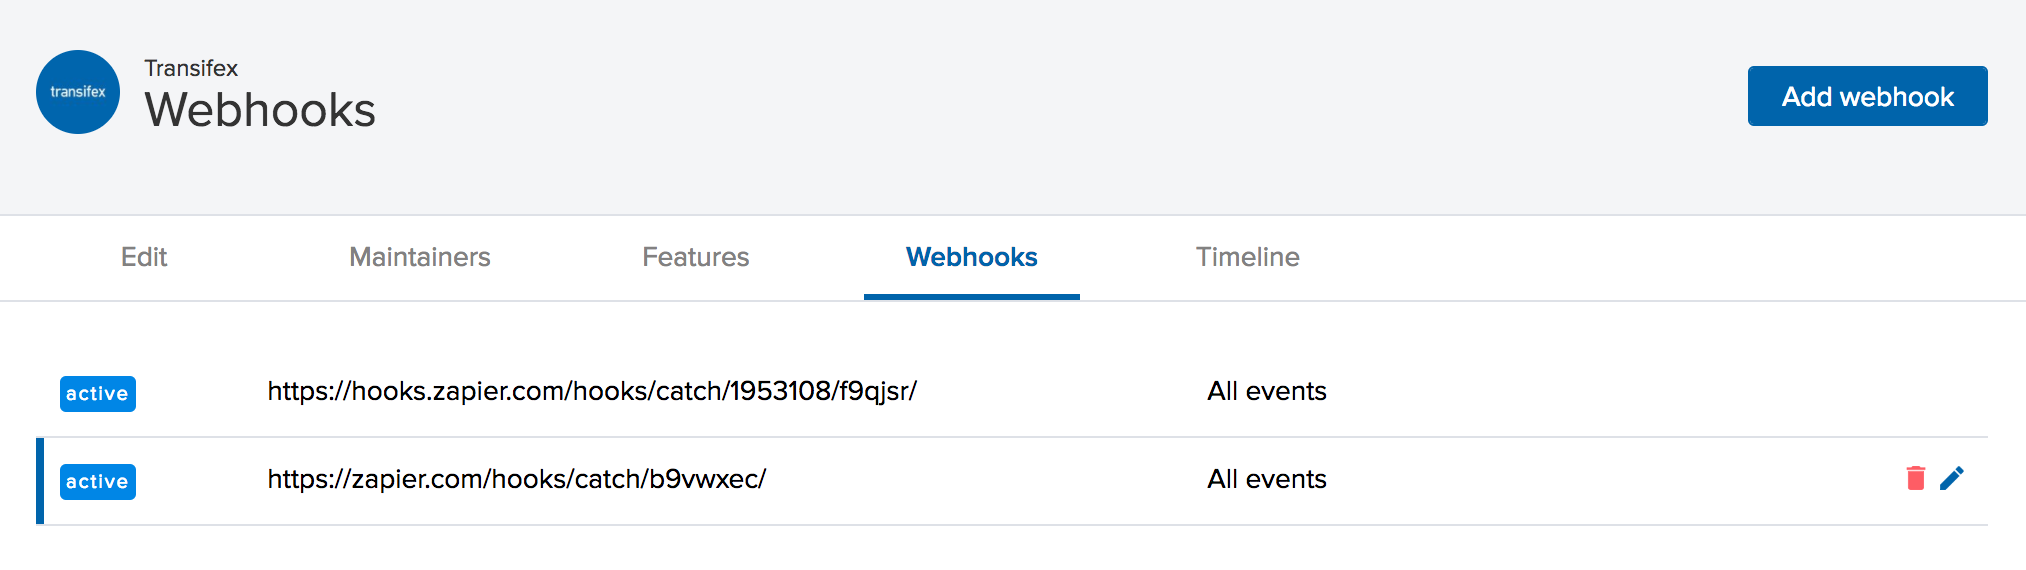 webhook overview